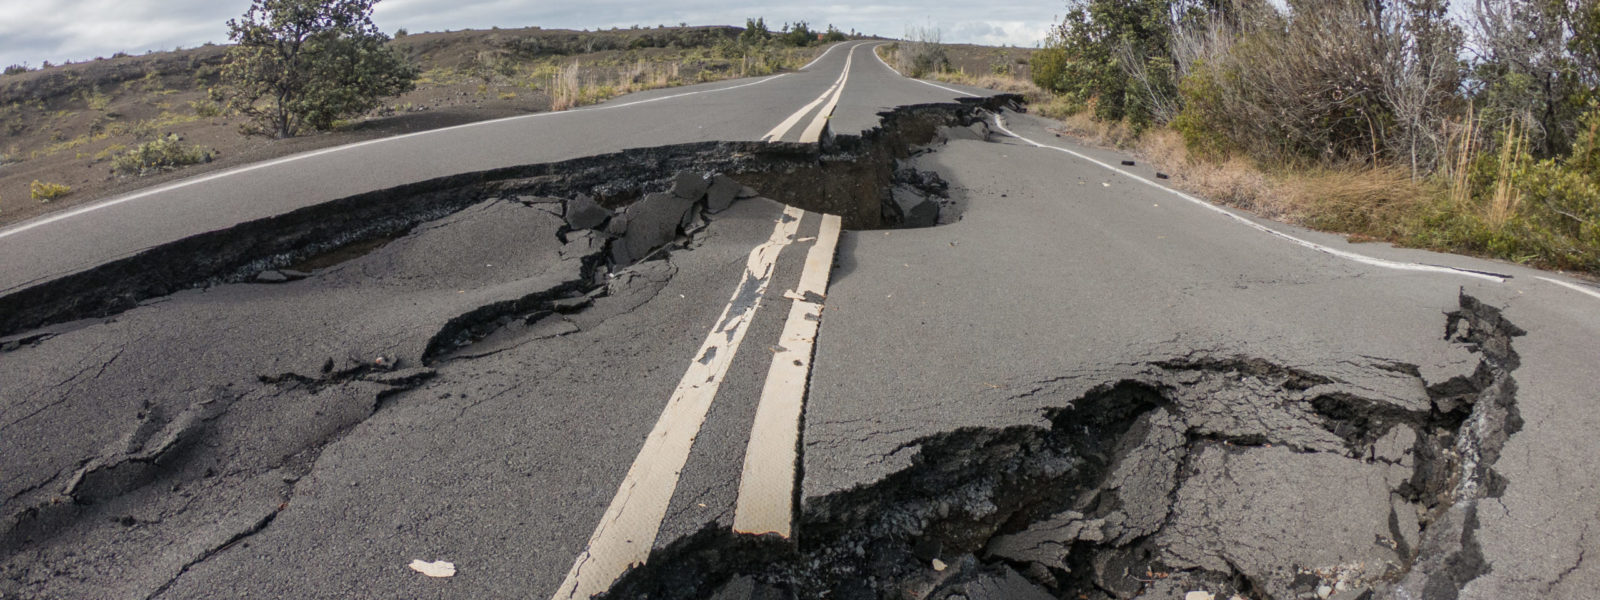 Cracked road from volcano activity in Volcano national park, Hawaii